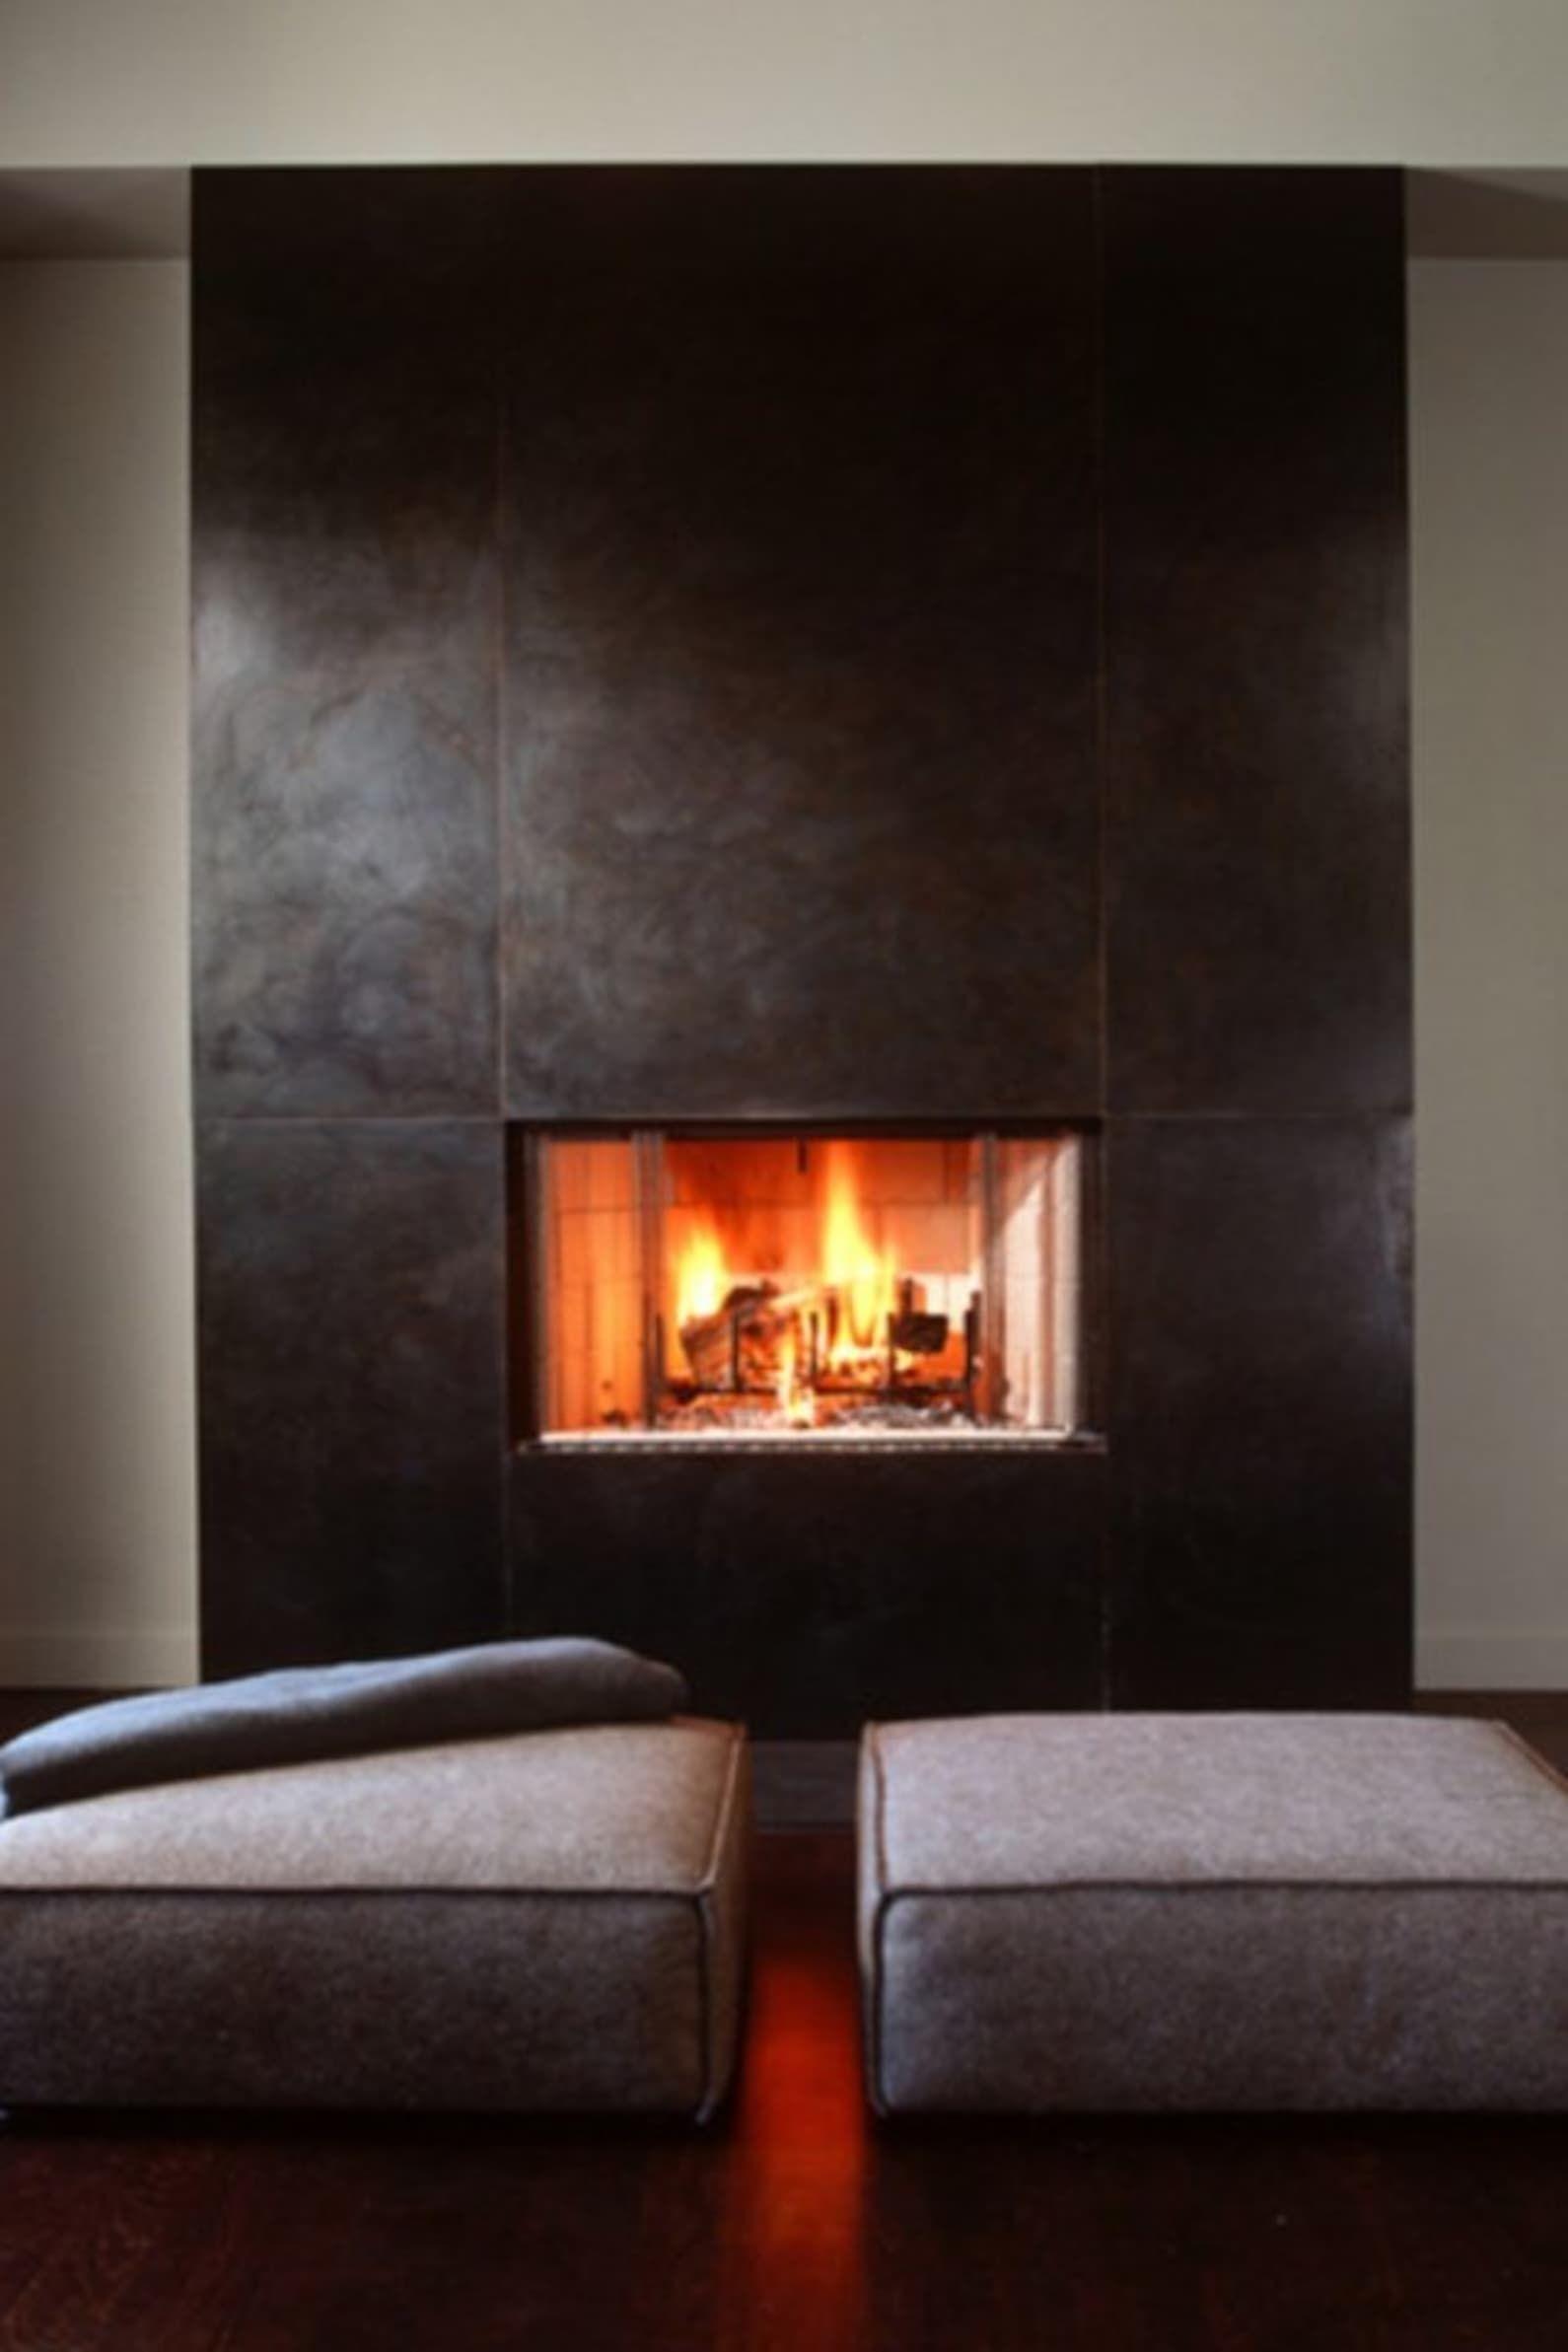 Inspiring Beautiful Unusual Fireplace Surrounds Gallery Image 3